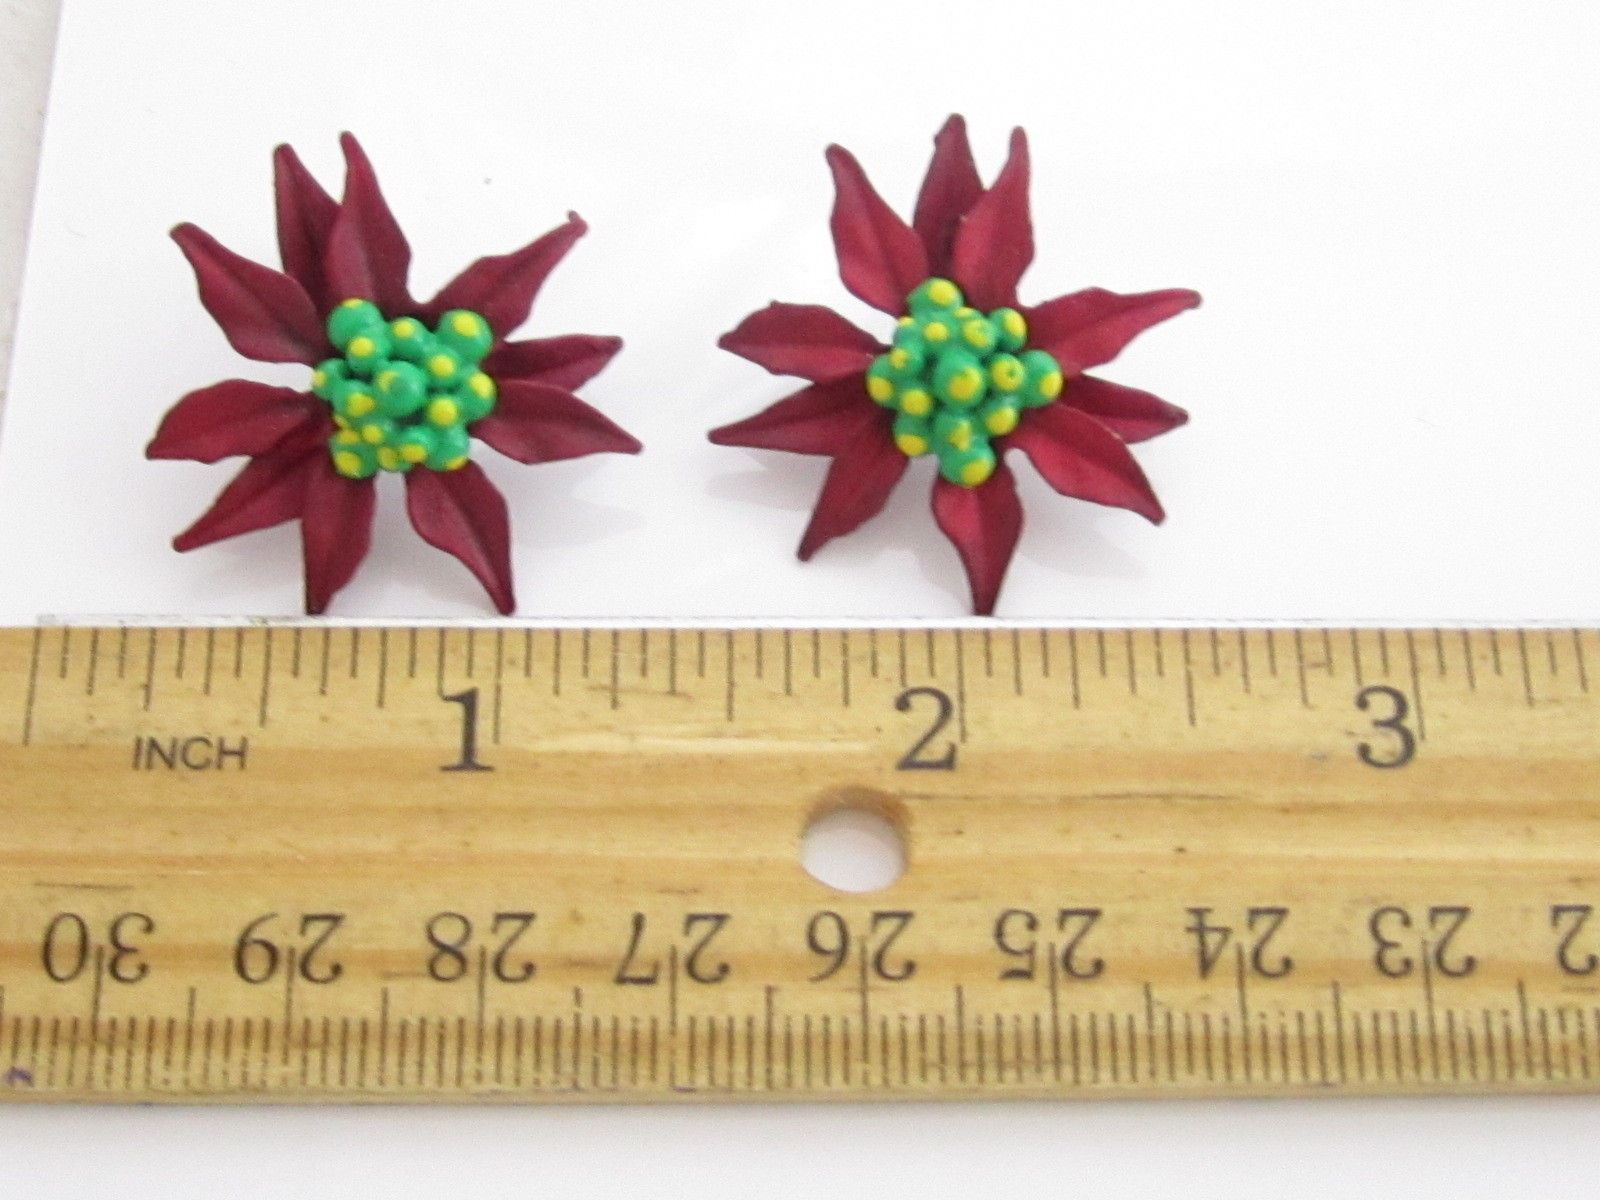 Festive Deep Red & Green Enamel Poinsetta Flower Christmas Fashion Earrings*694D